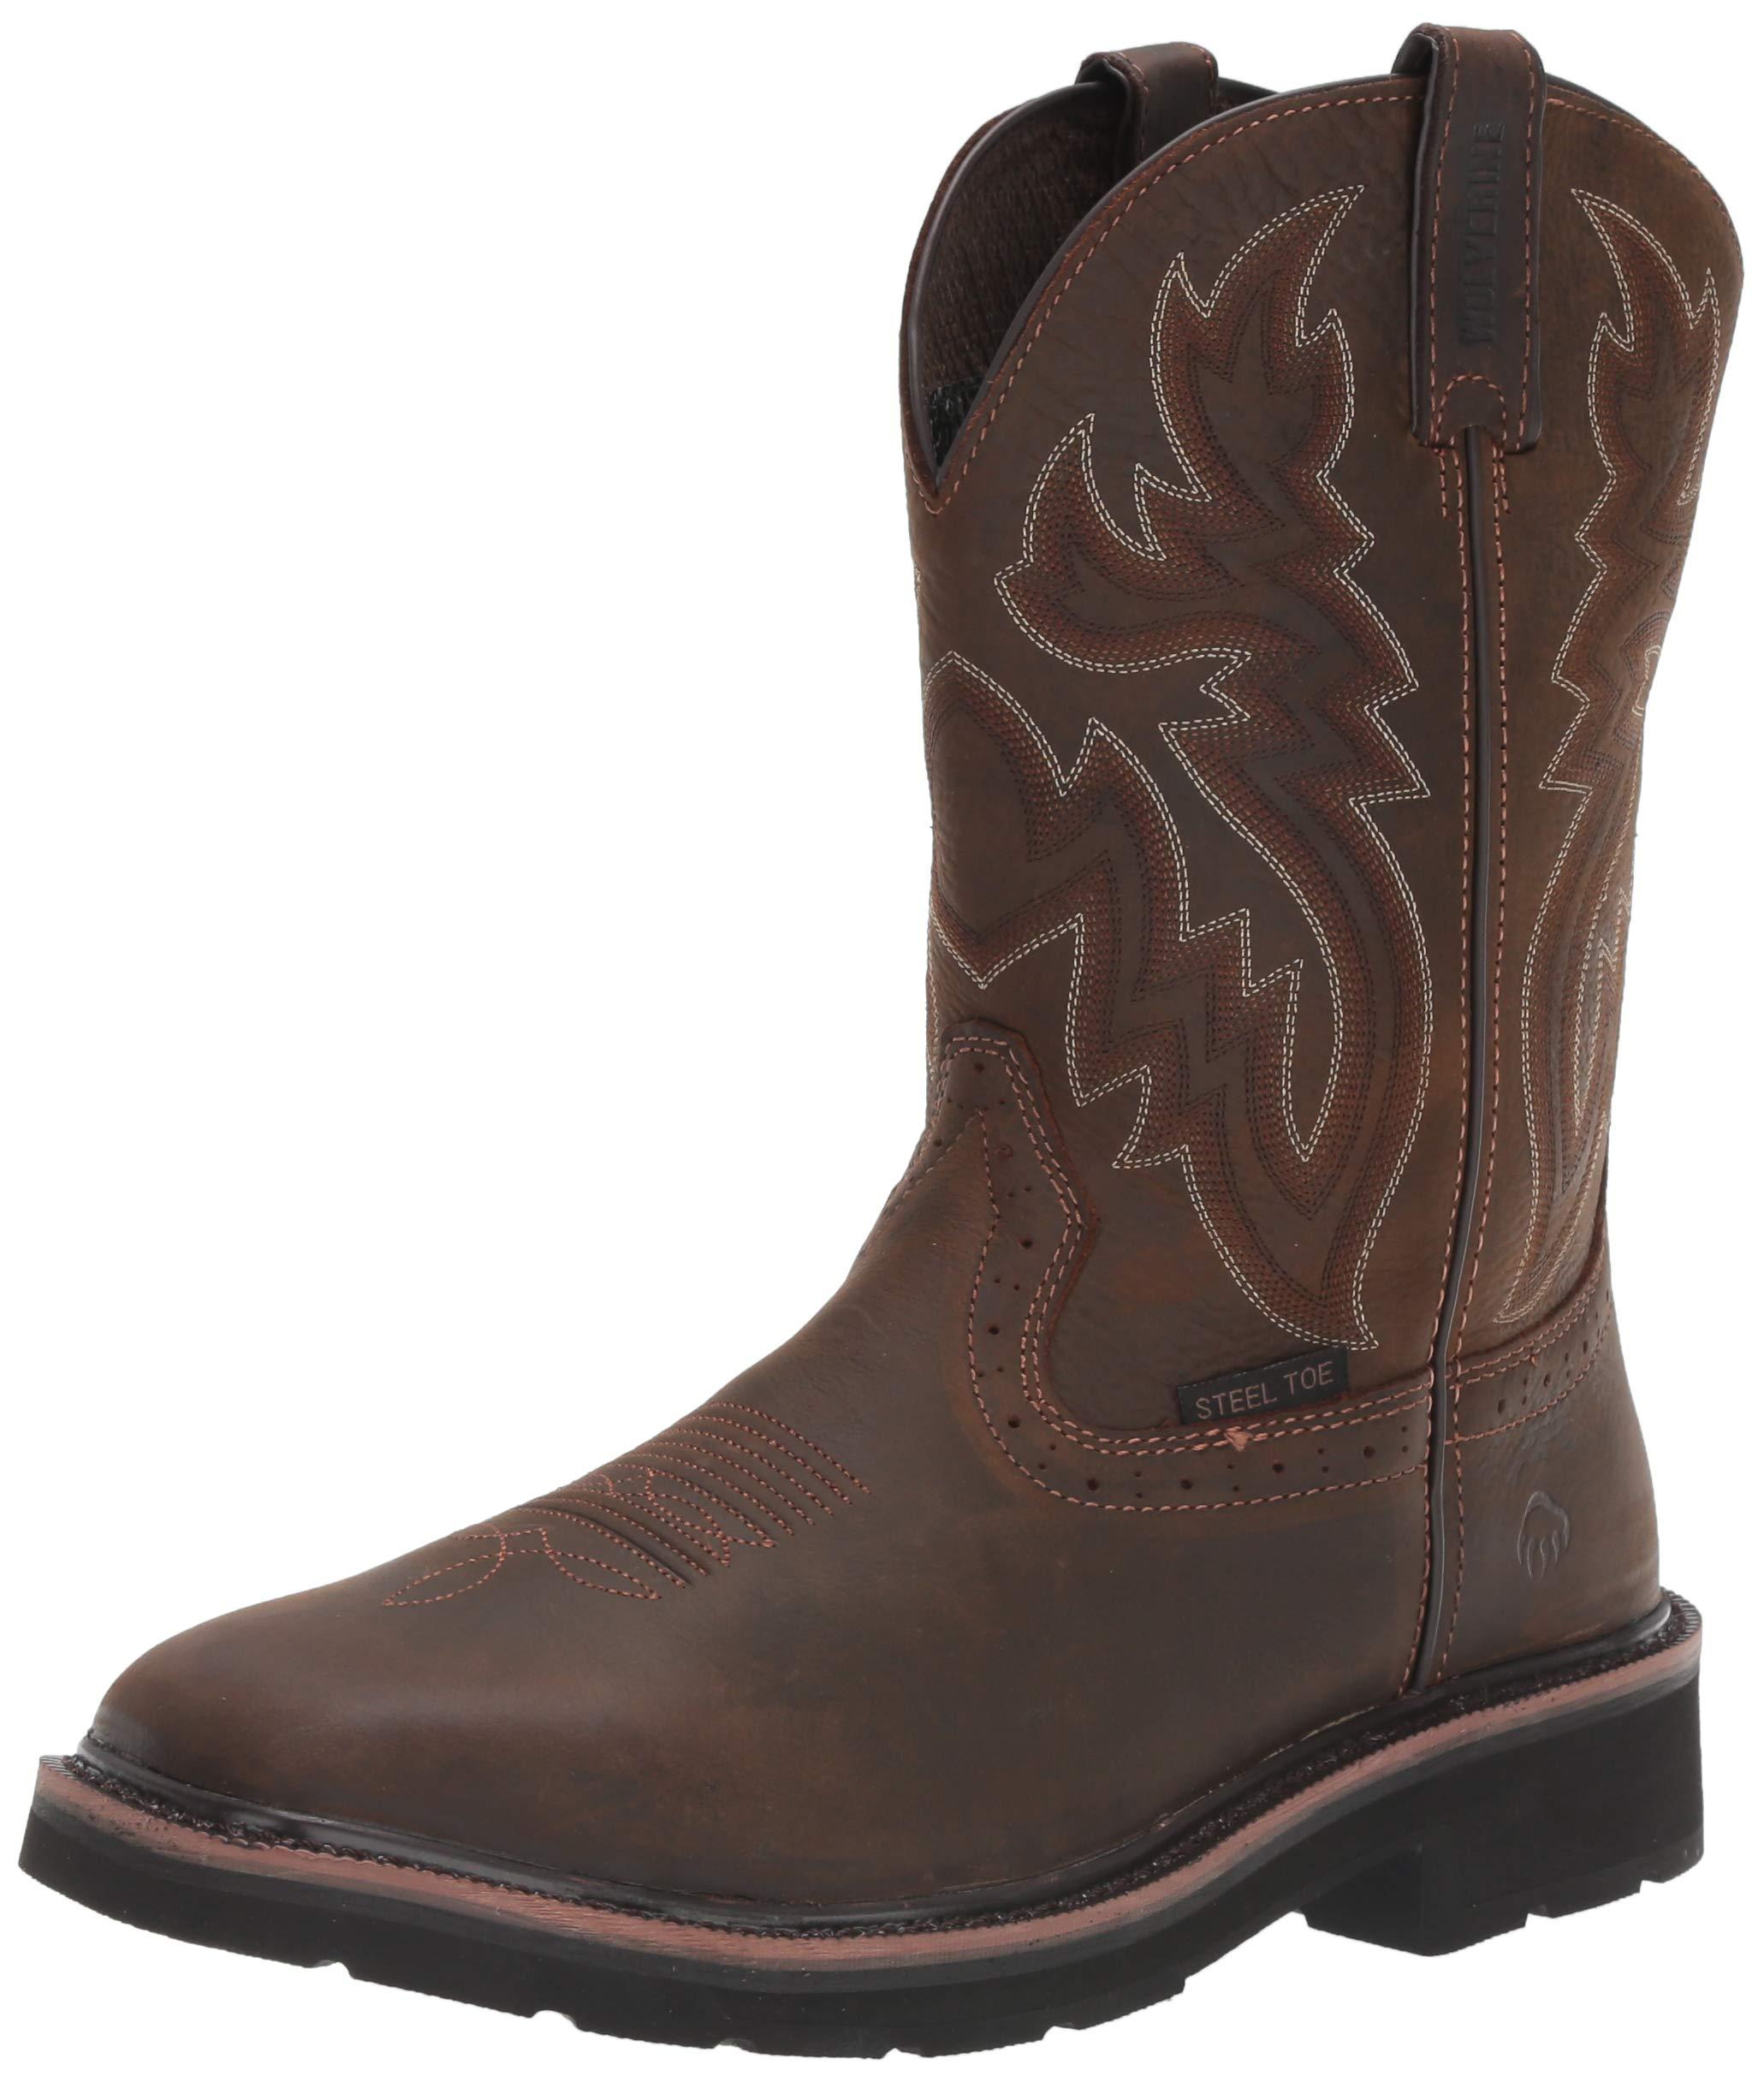 Wolverine Men's Rancher 10'' Square Steel Toe Work Boot, Dark Brown/Rust, 9 M US by Wolverine